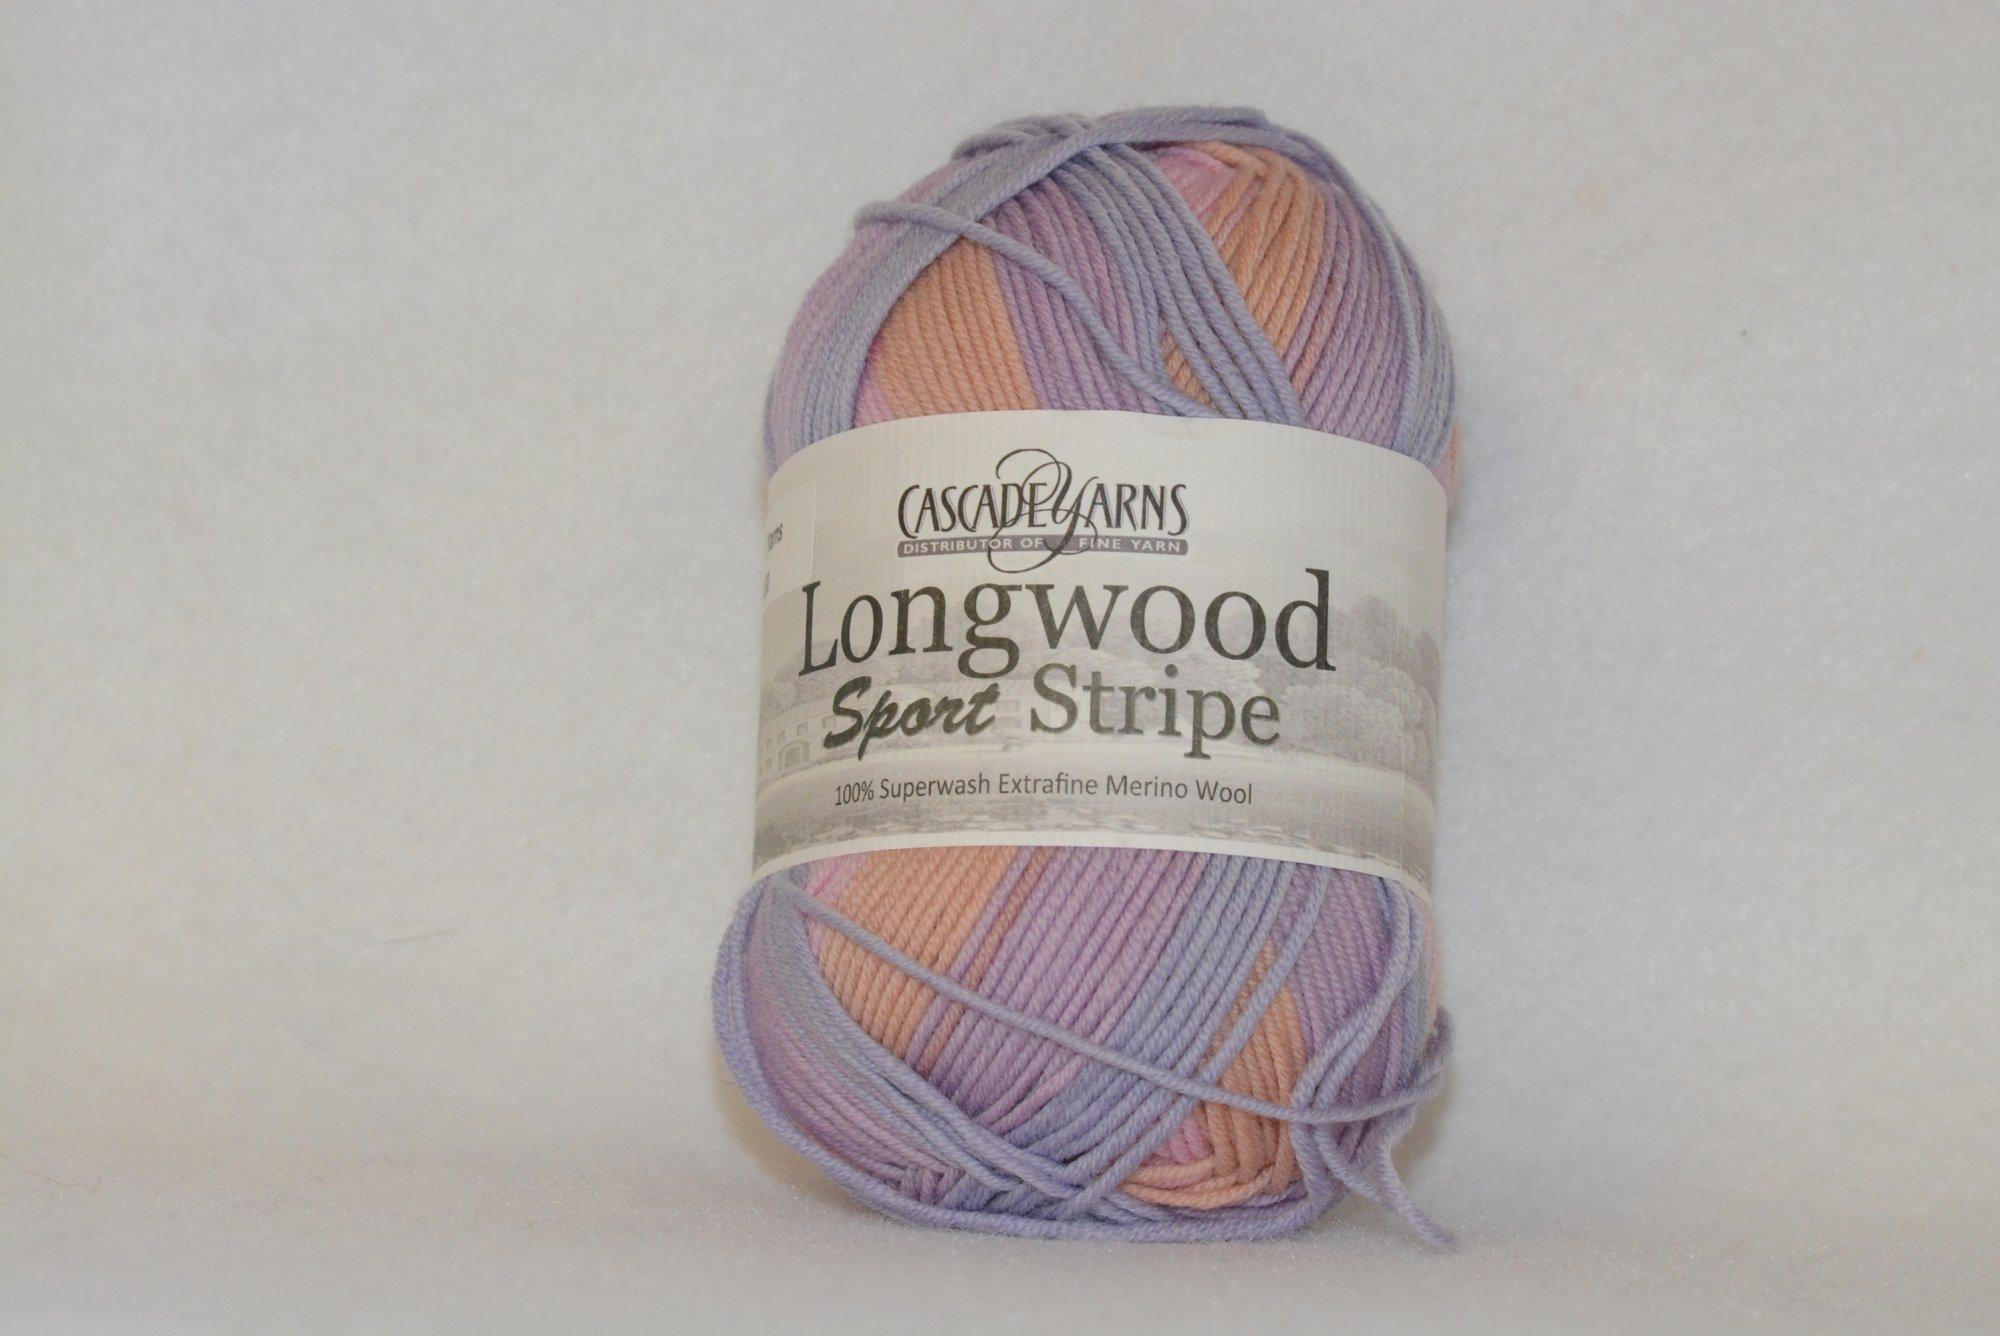 Longwood Sport Stripes - 505 - Pink/Coral/Purple/Blue